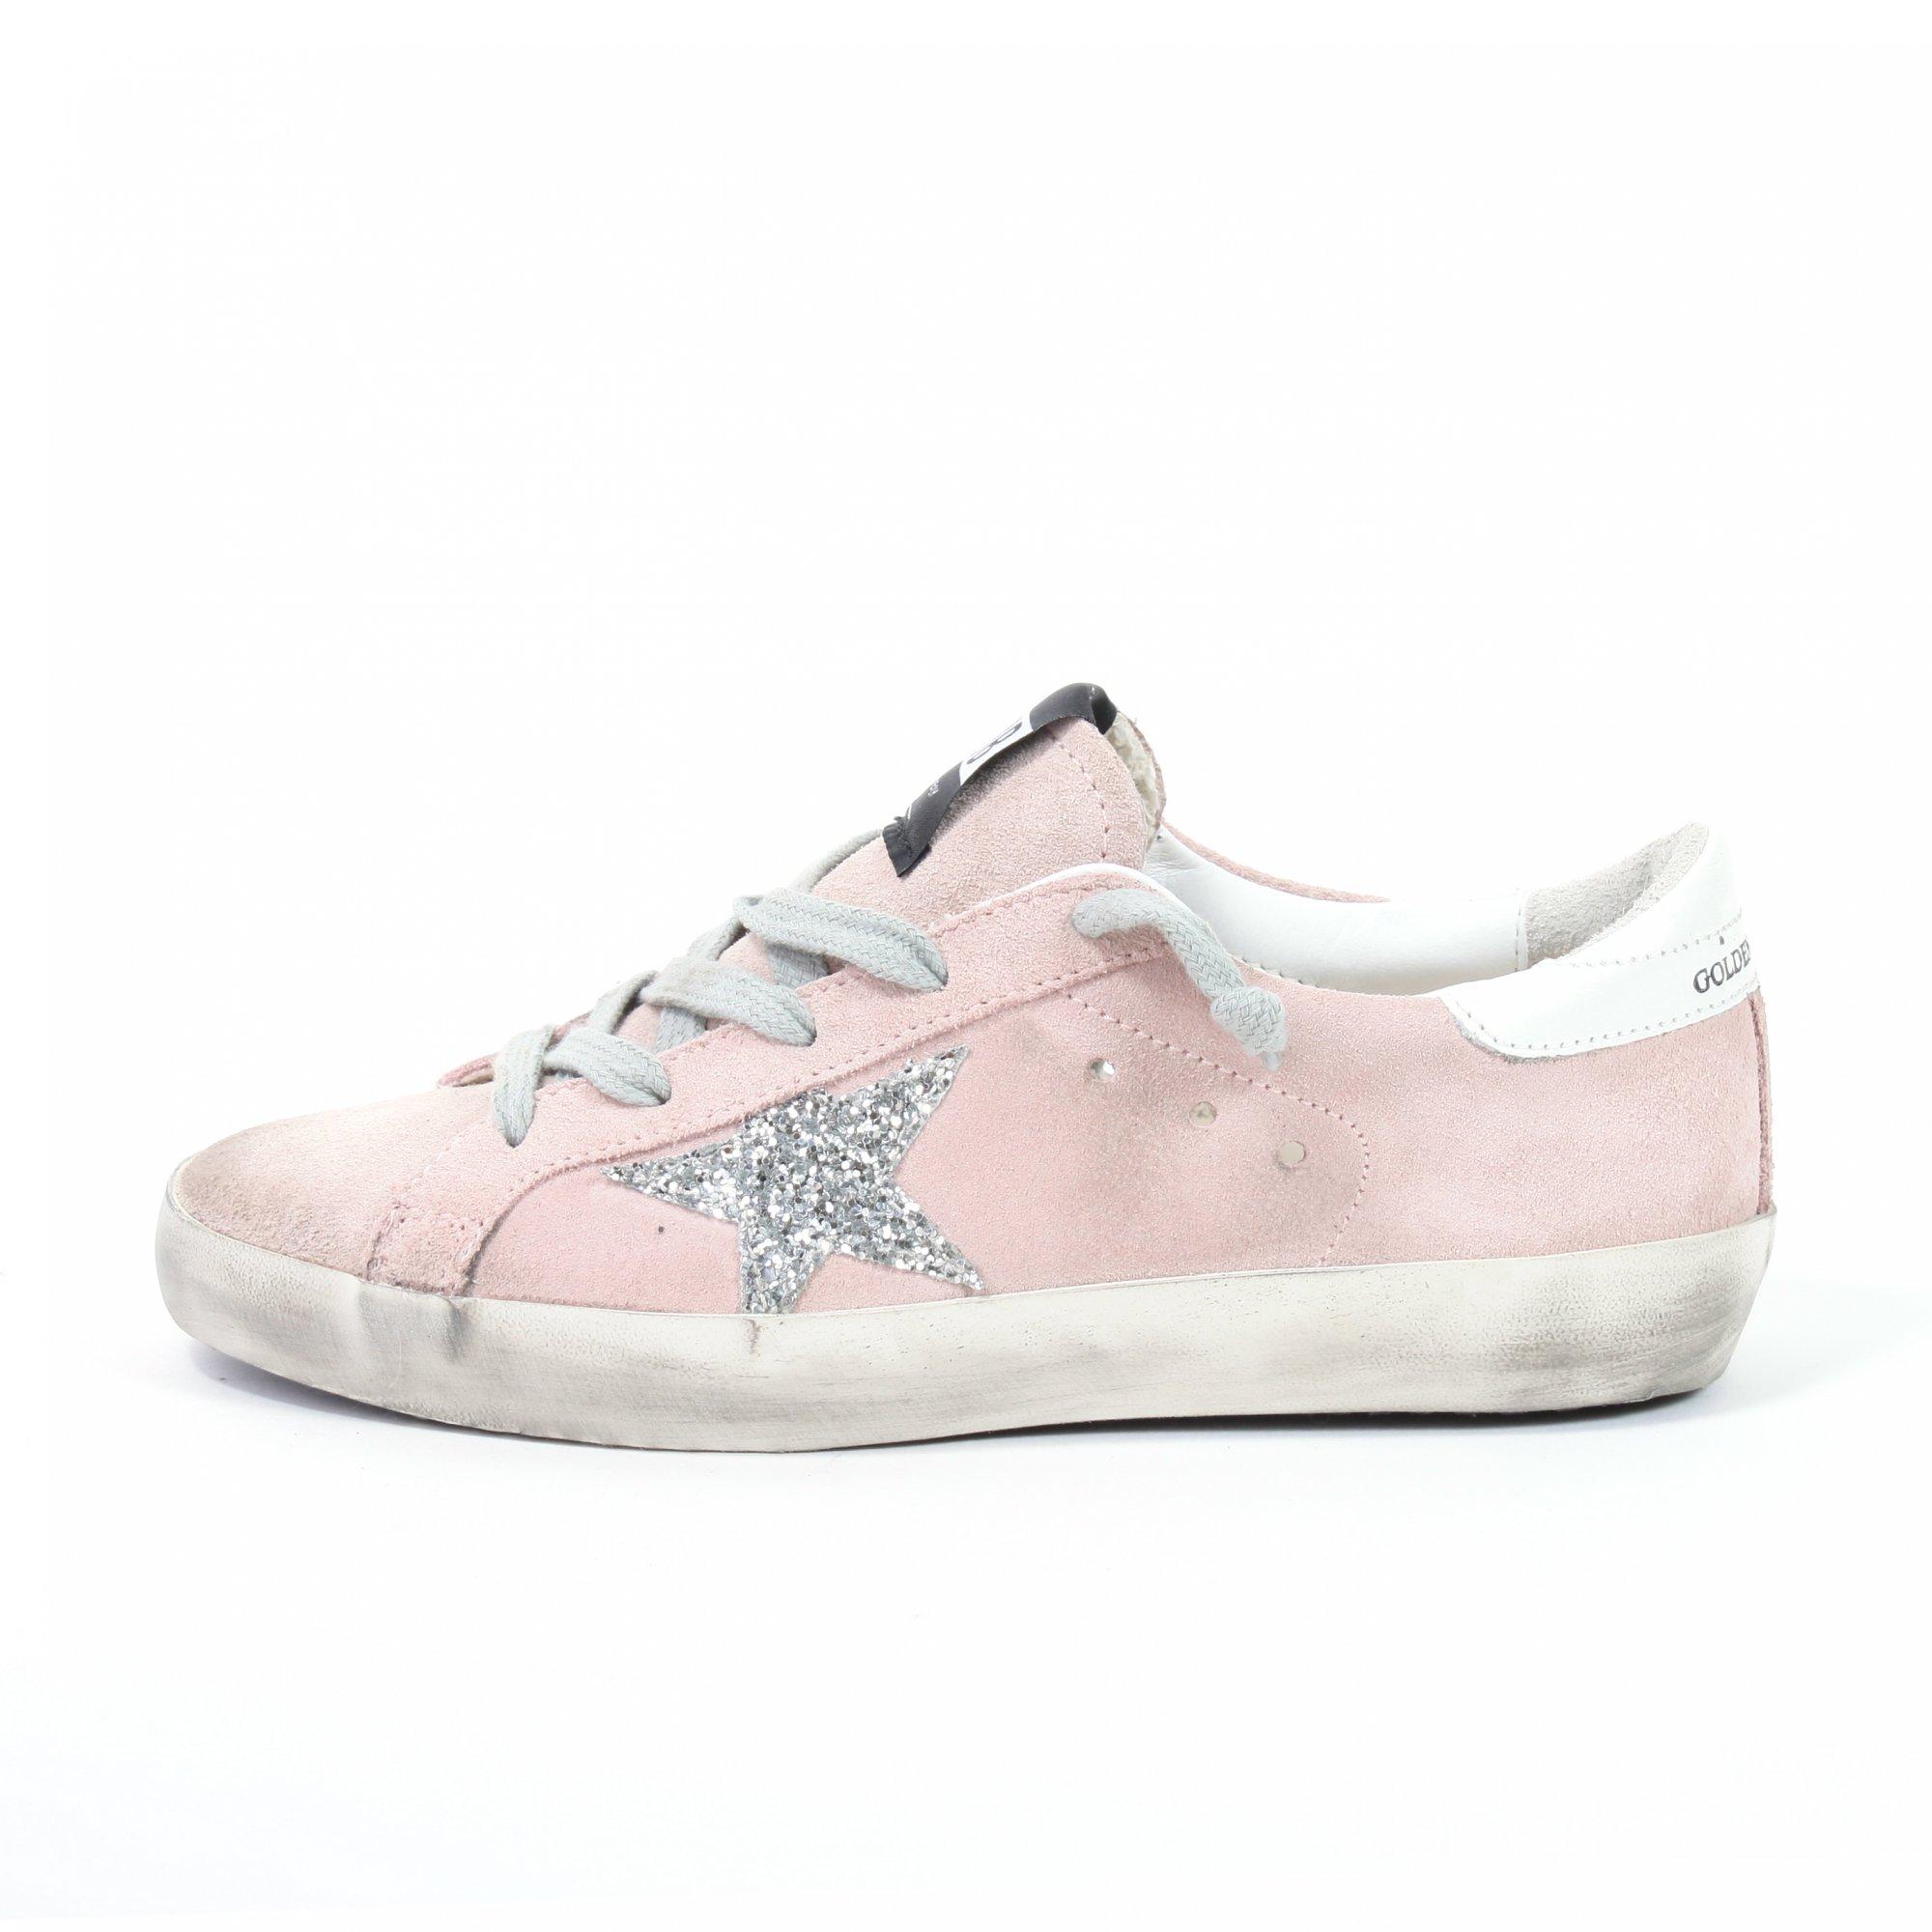 Sneakers con stella glitterate DaWe2wq